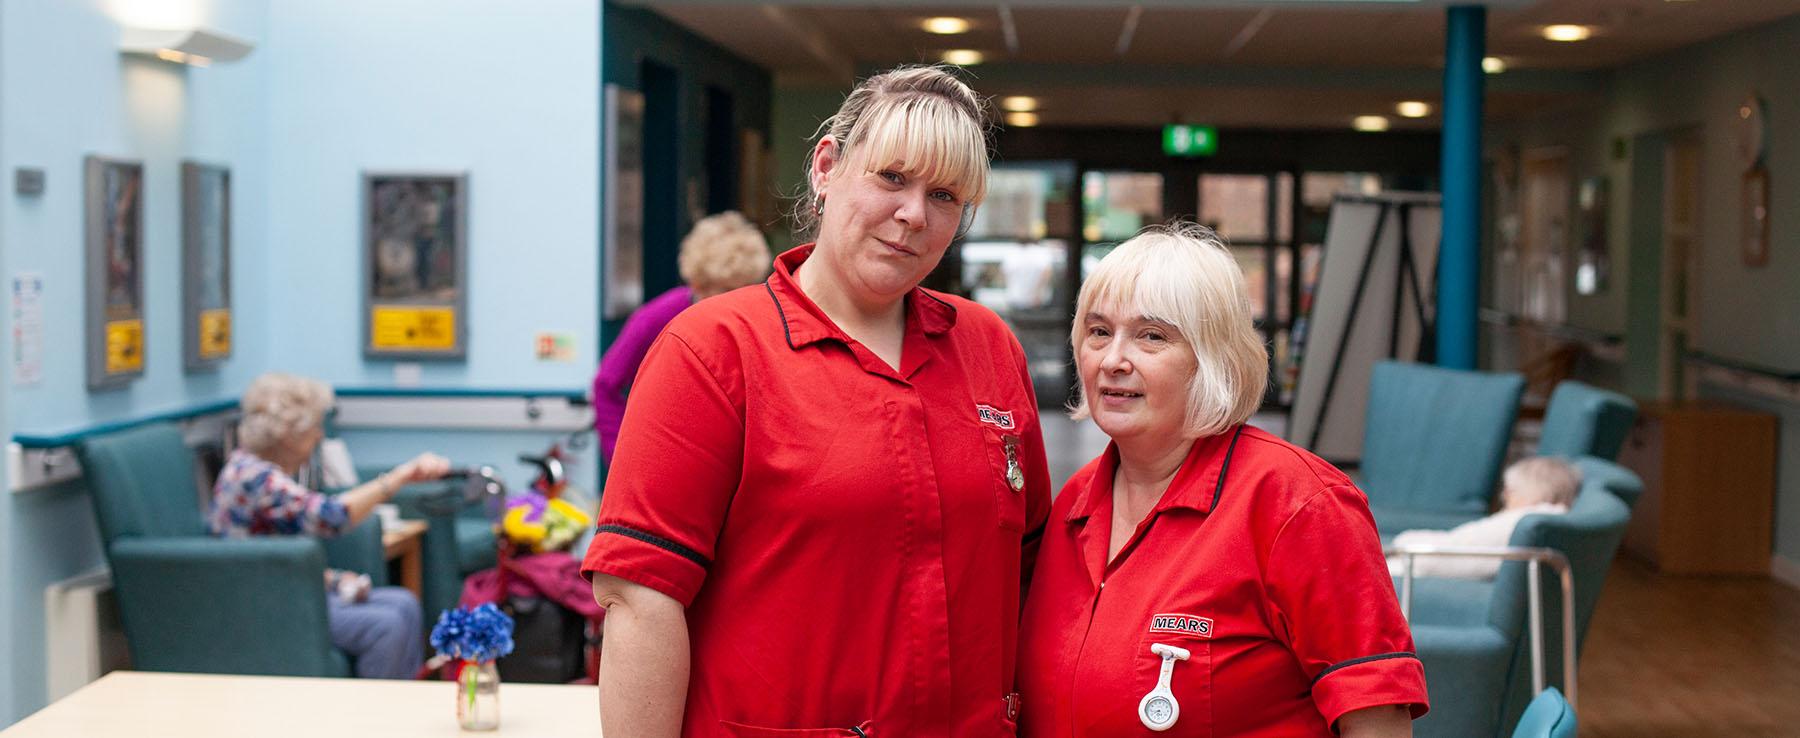 Proud to Care - Care first 8 2019 - CB Bristol Design 2019